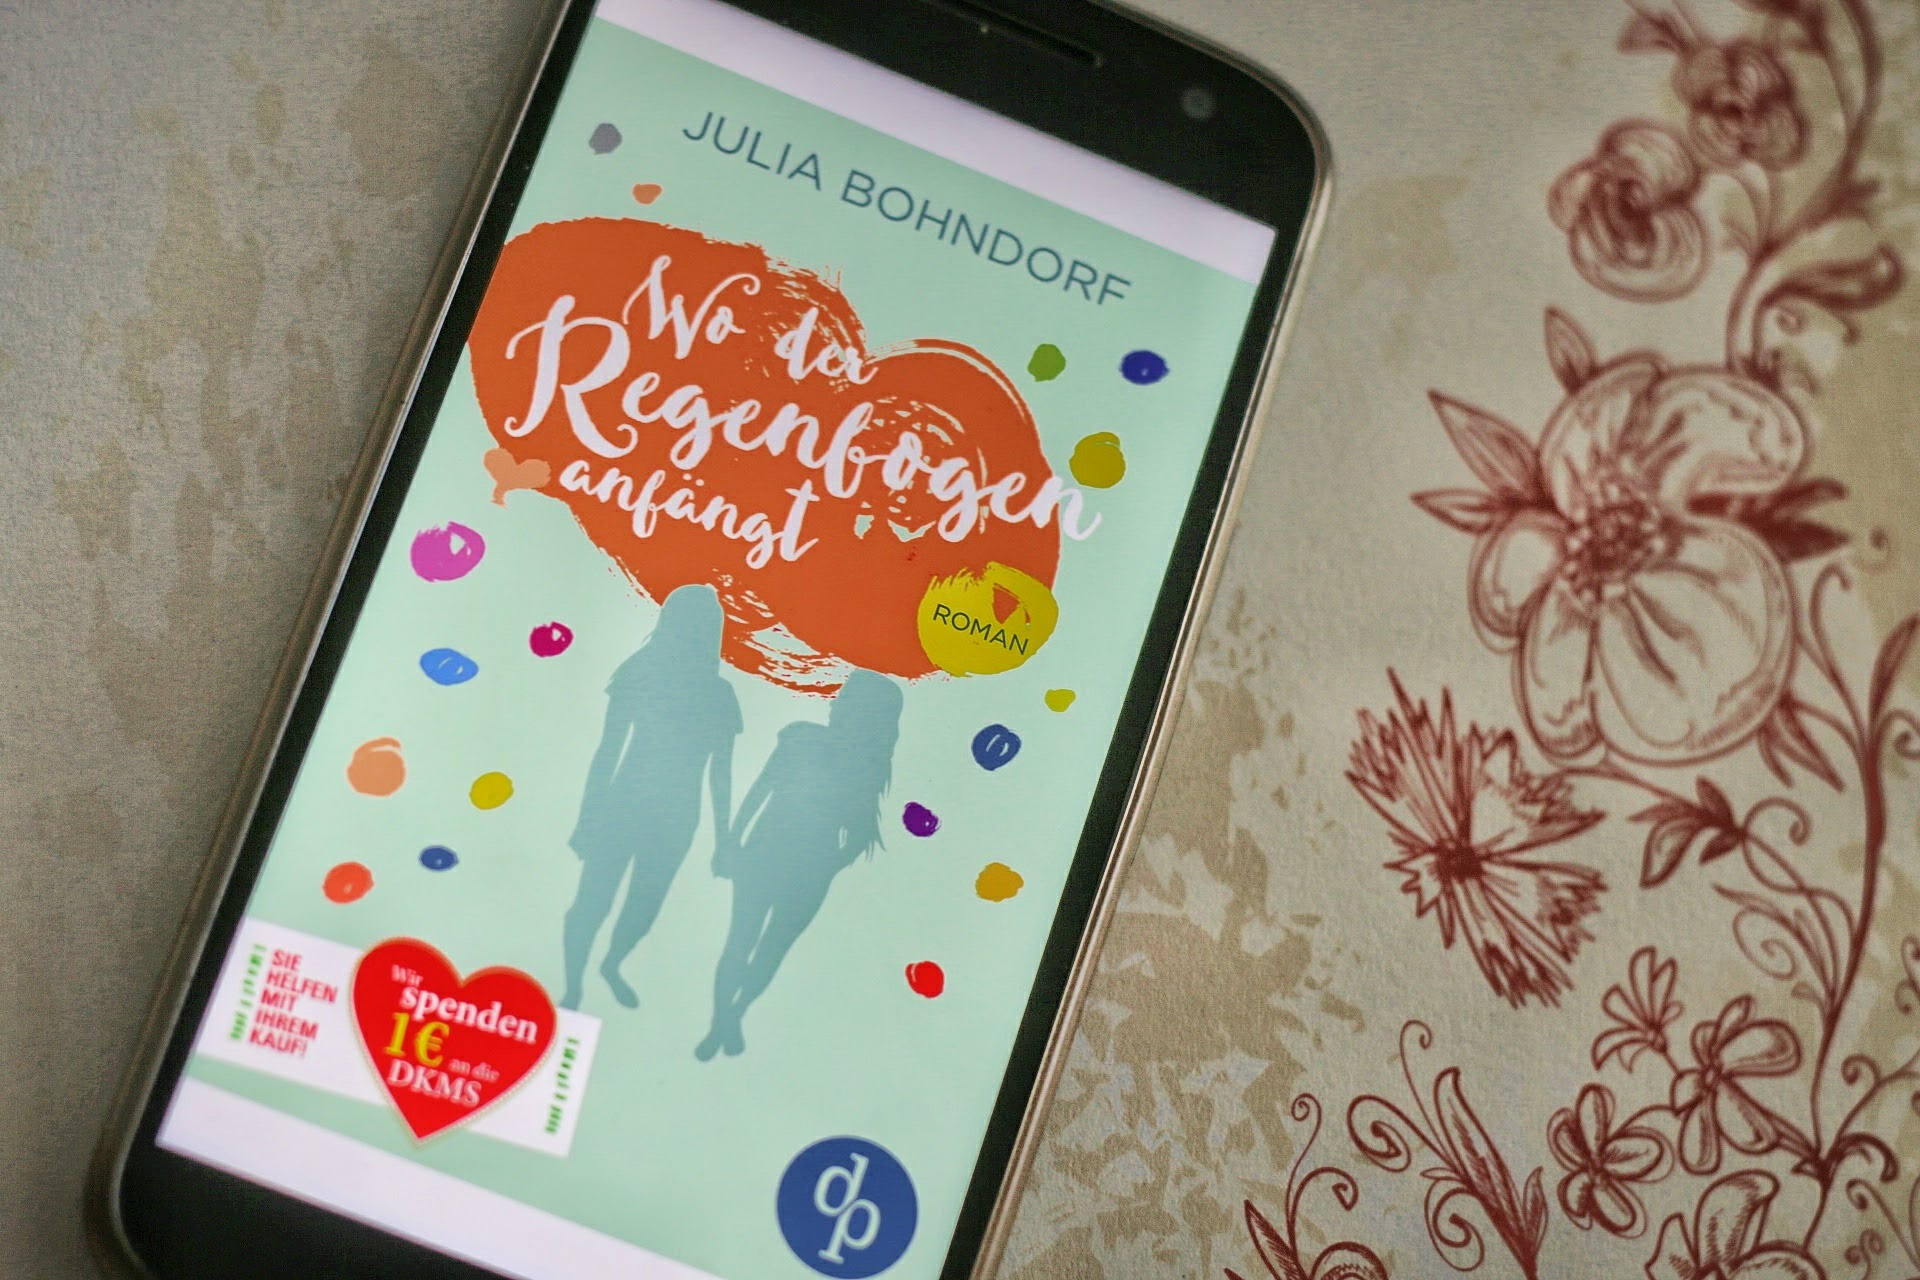 Julia Bohndorf Wo der Regenbogen anfängt Cover Digital Puplishers Verlag DKMS Knochenmark Roman eBook